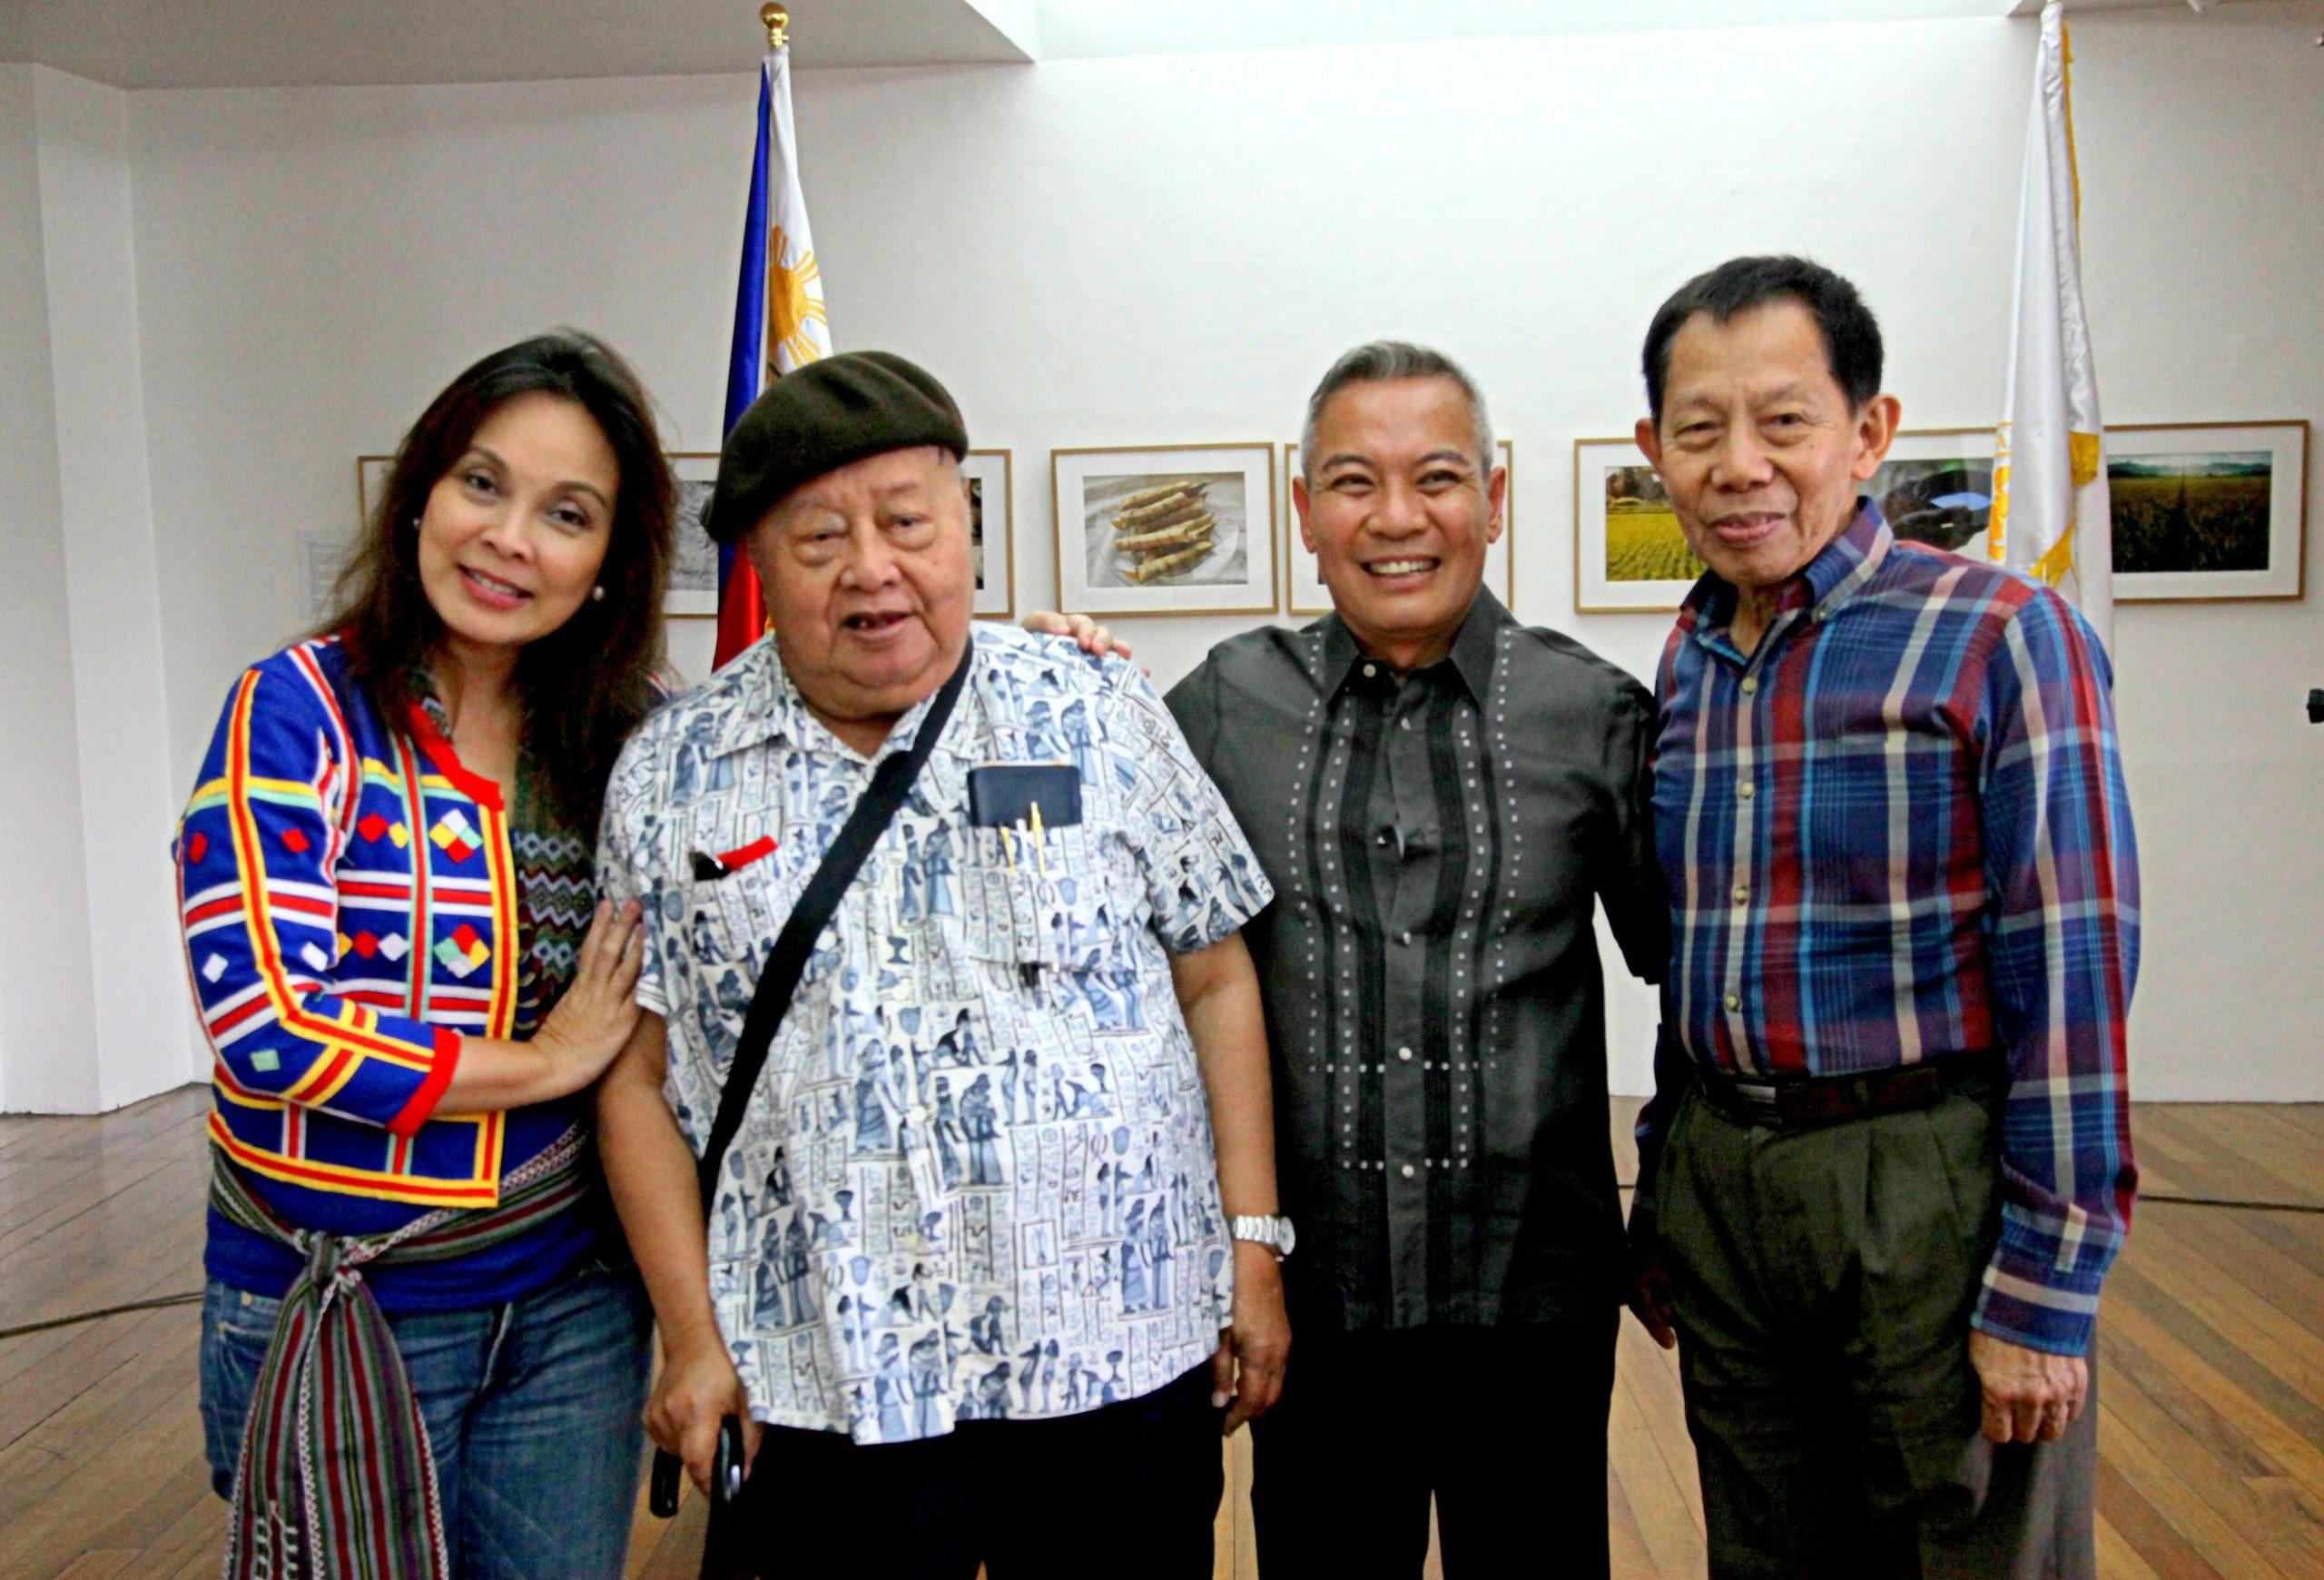 Heritage, Makakain Ba 'Yan? Lecture at the National Museum